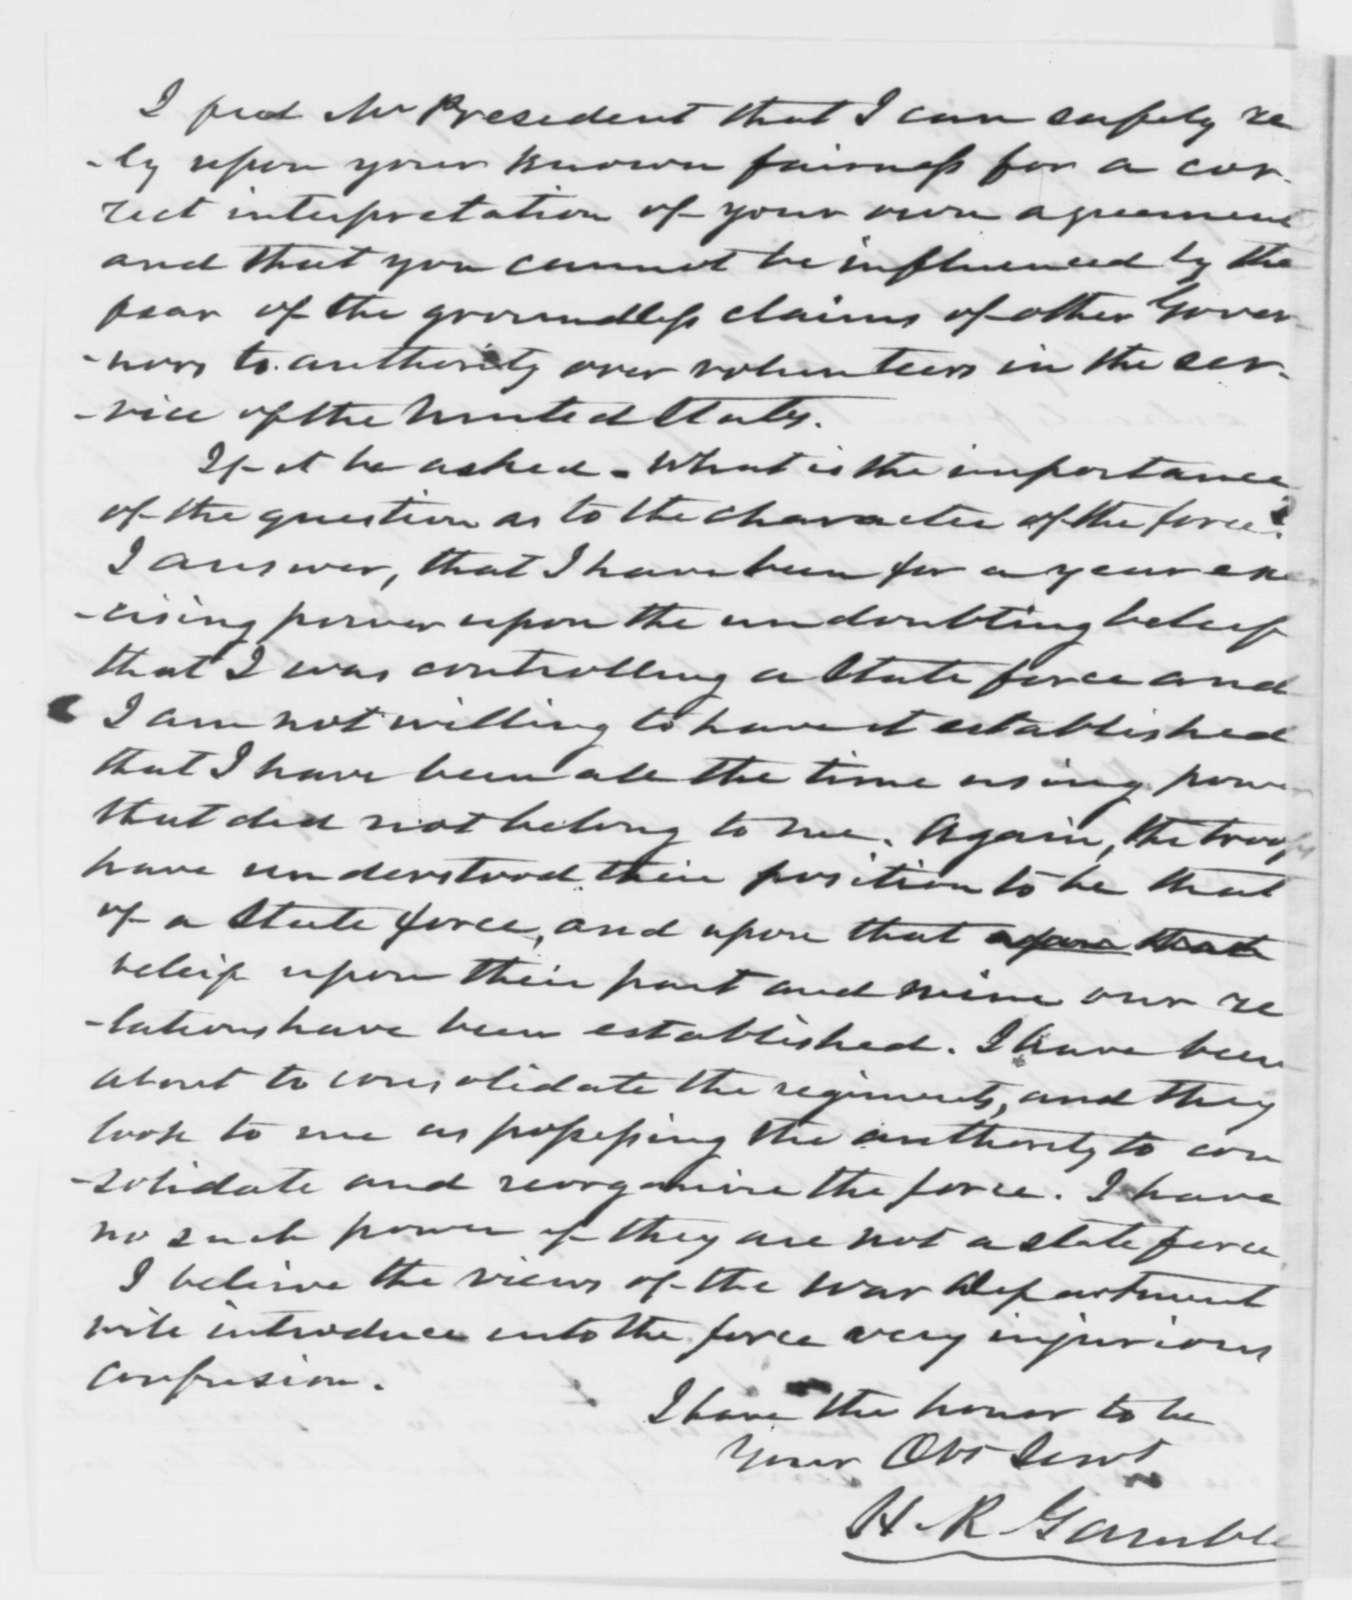 Hamilton R. Gamble to Abraham Lincoln, Monday, November 17, 1862  (Military affairs in Missouri)